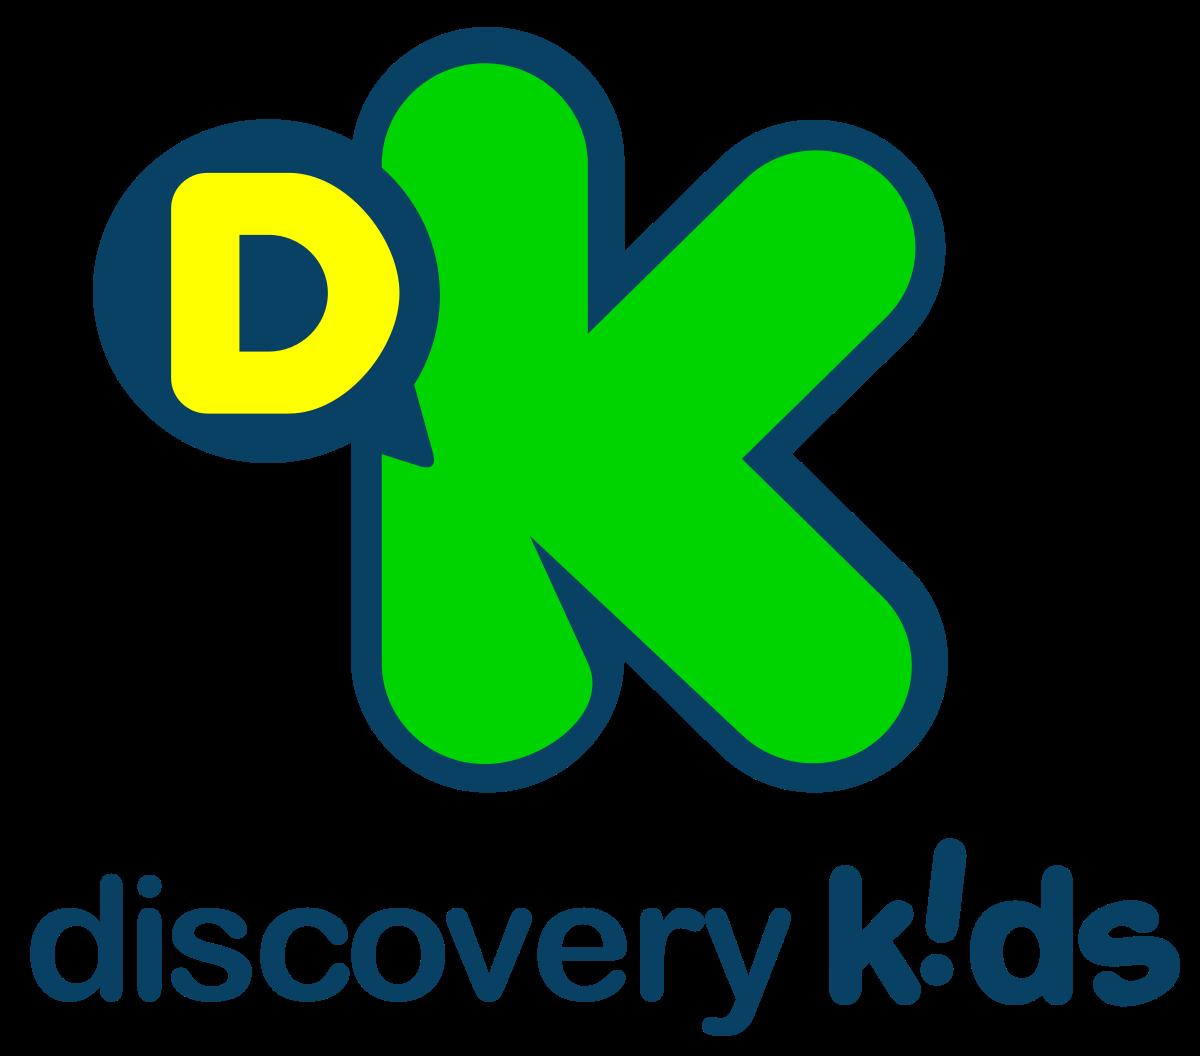 Discovery Kids (Sealandia and Zivia)